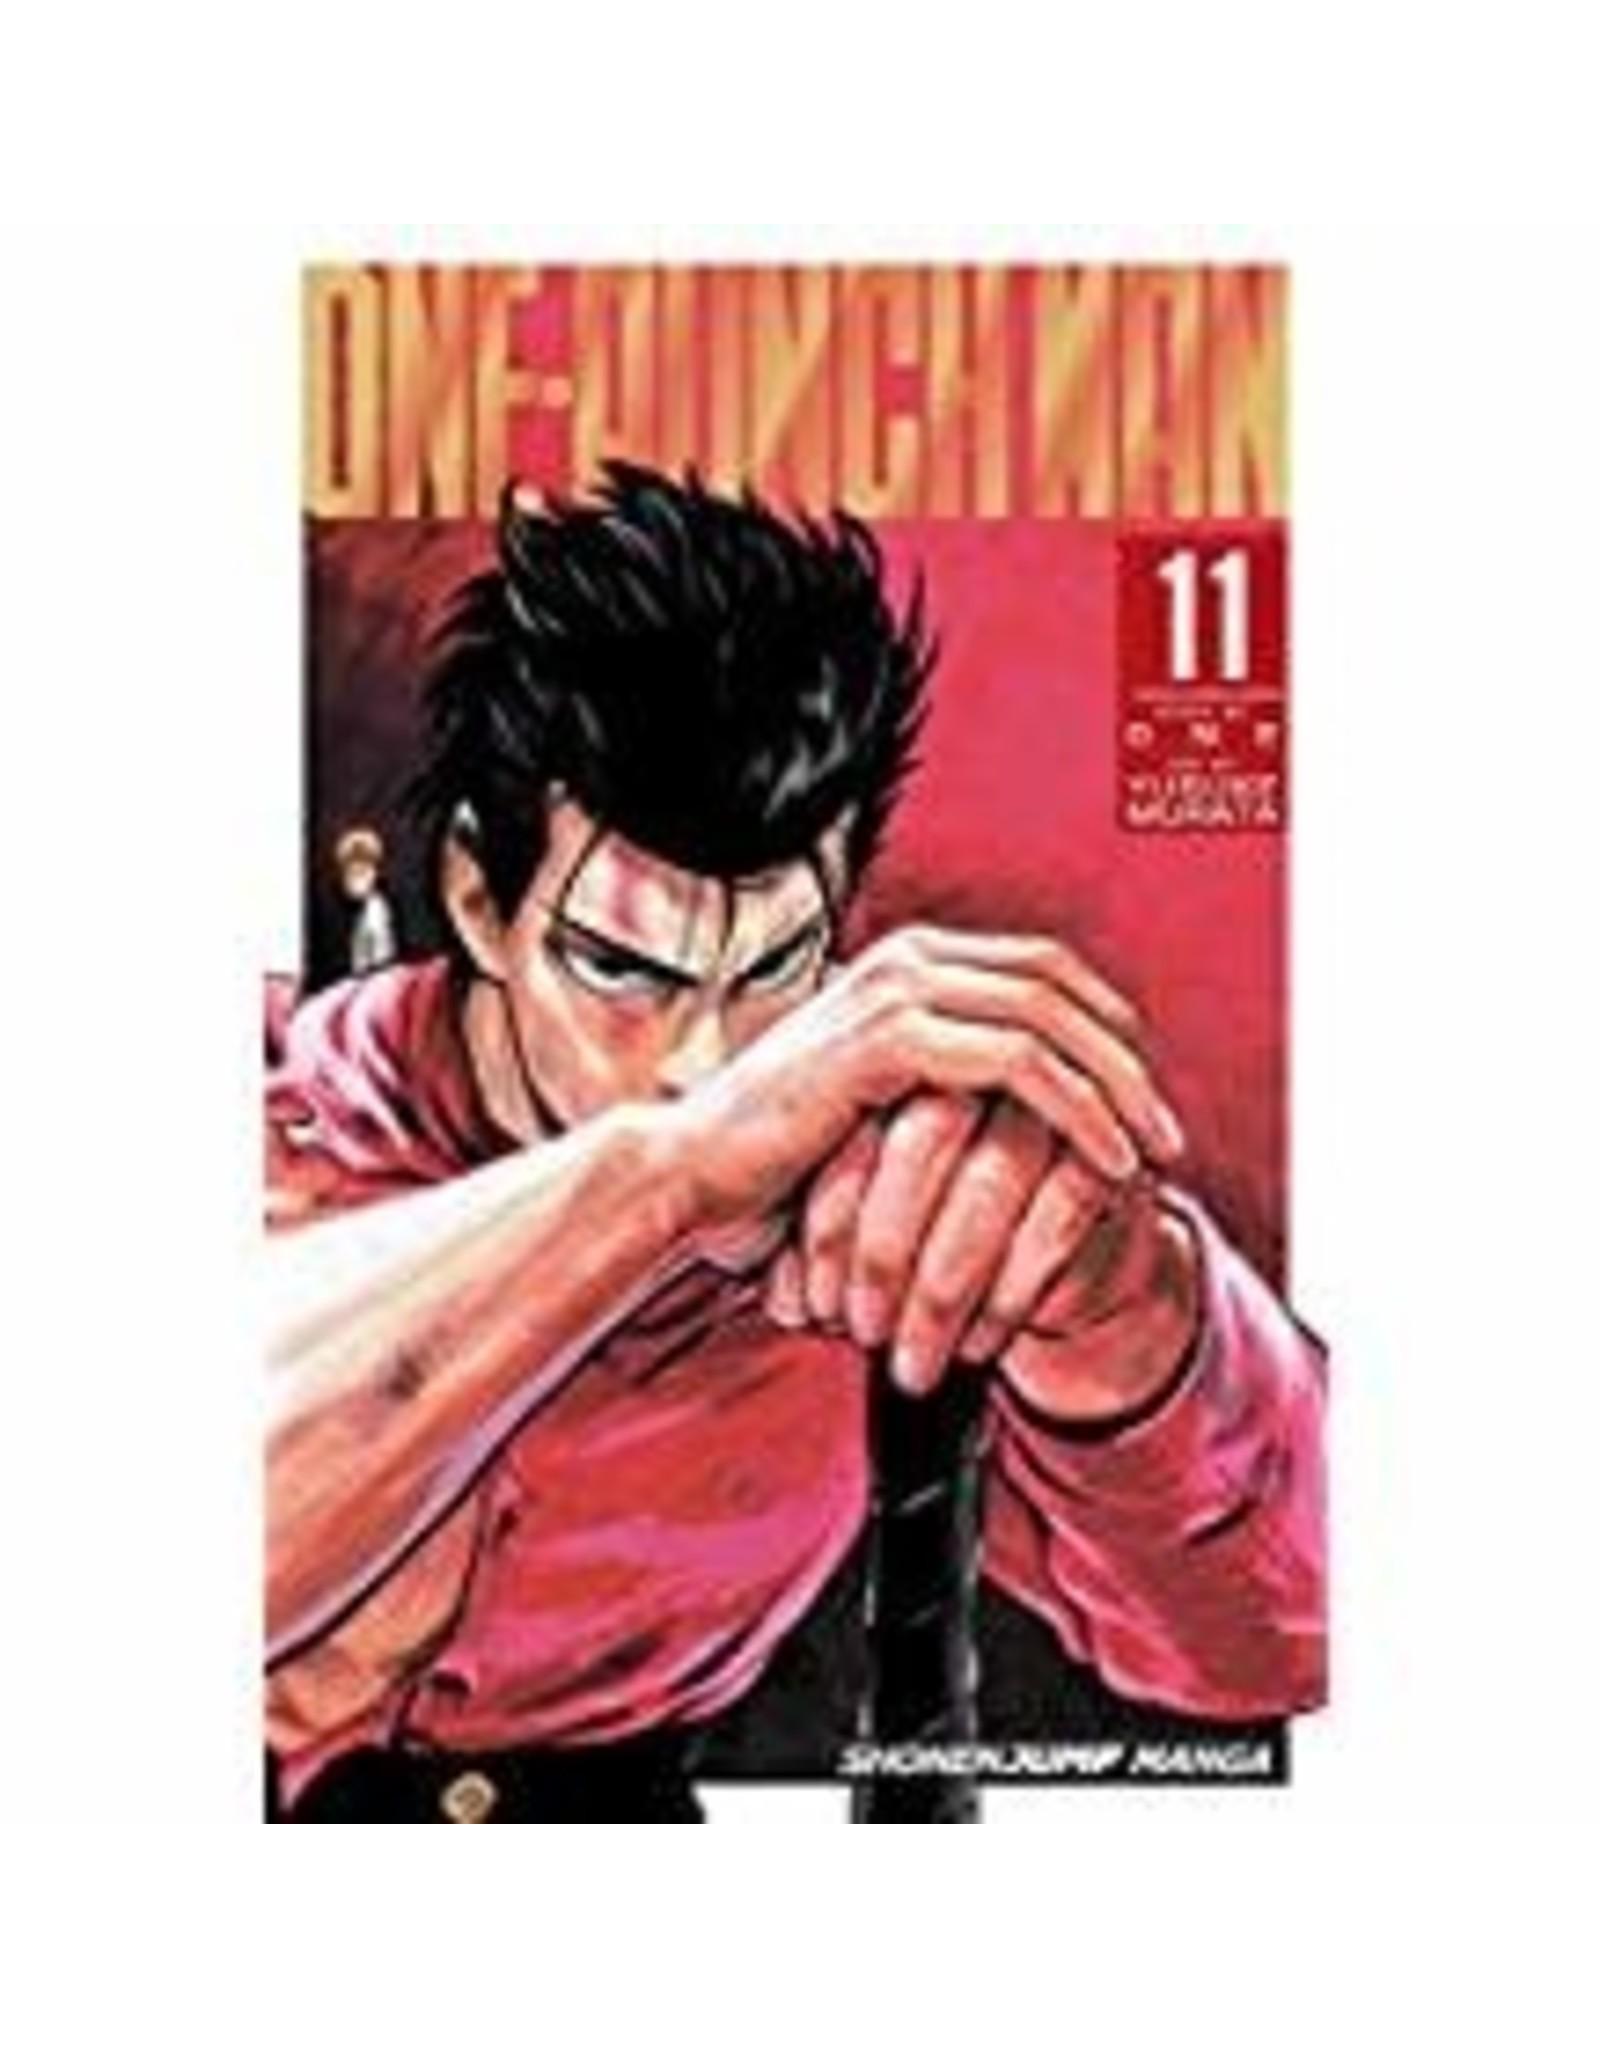 One-Punch Man Volume 11 (Engelstalig)